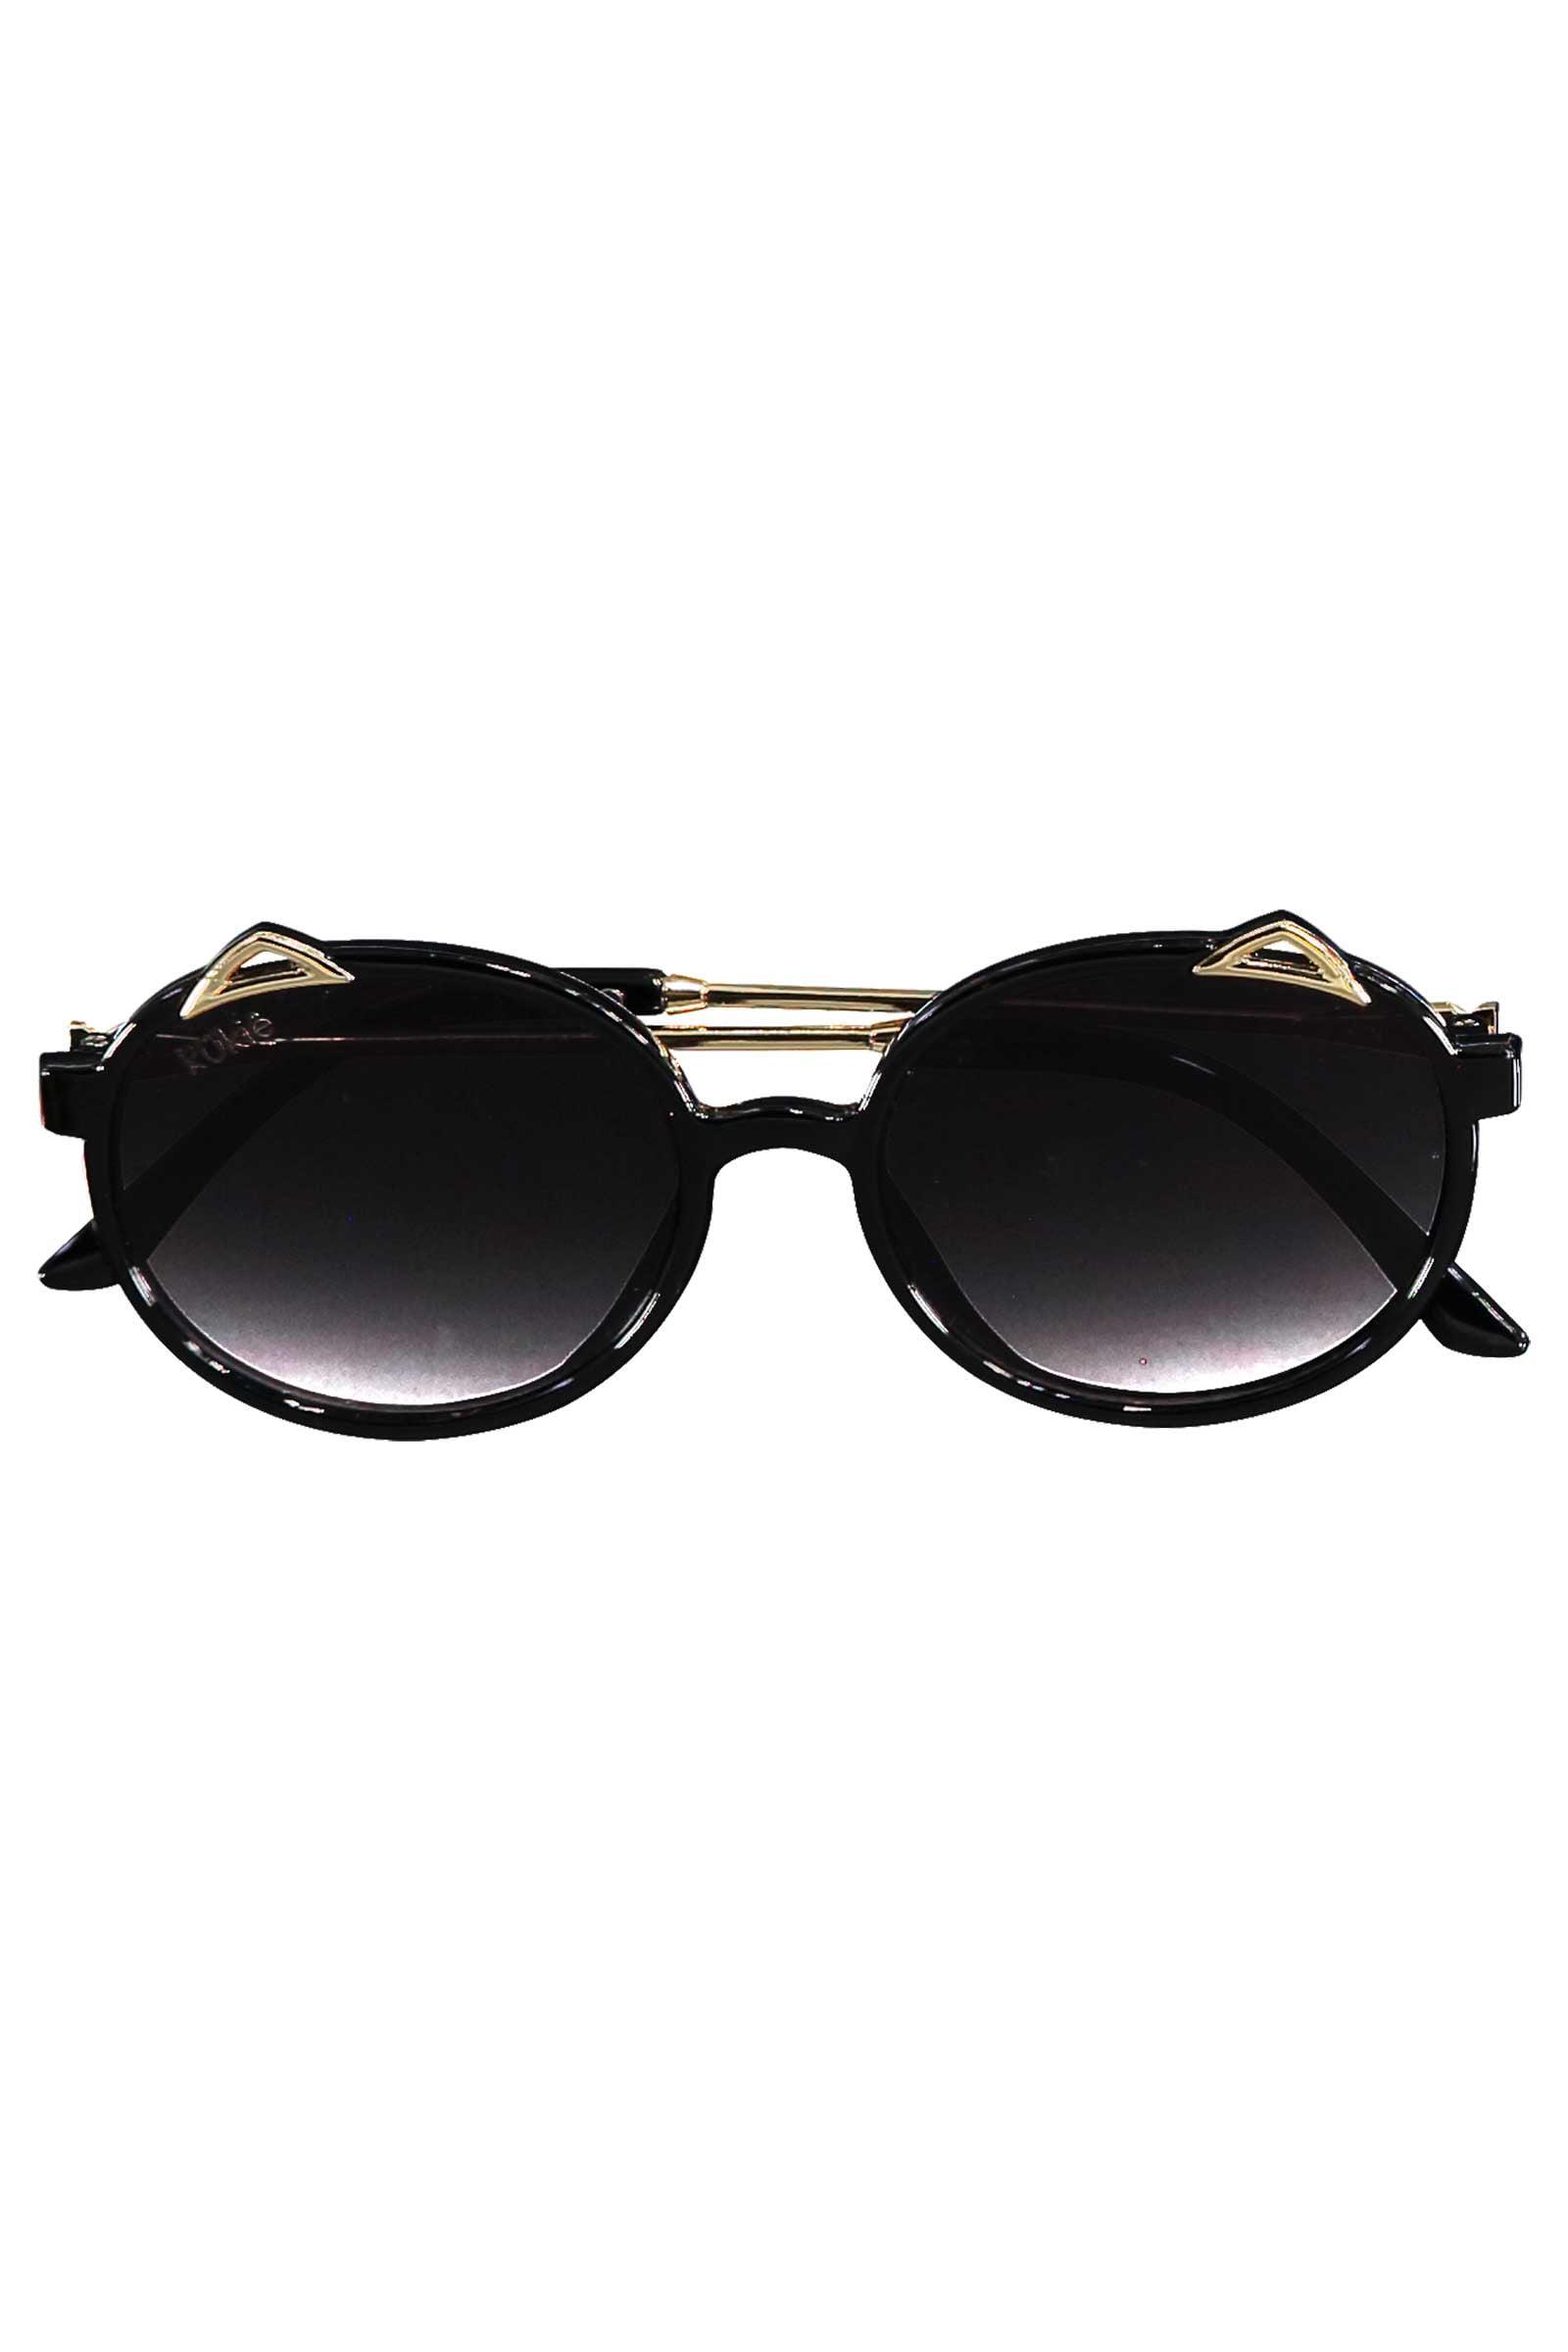 Óculos de Sol Kukie Preto Gatinha